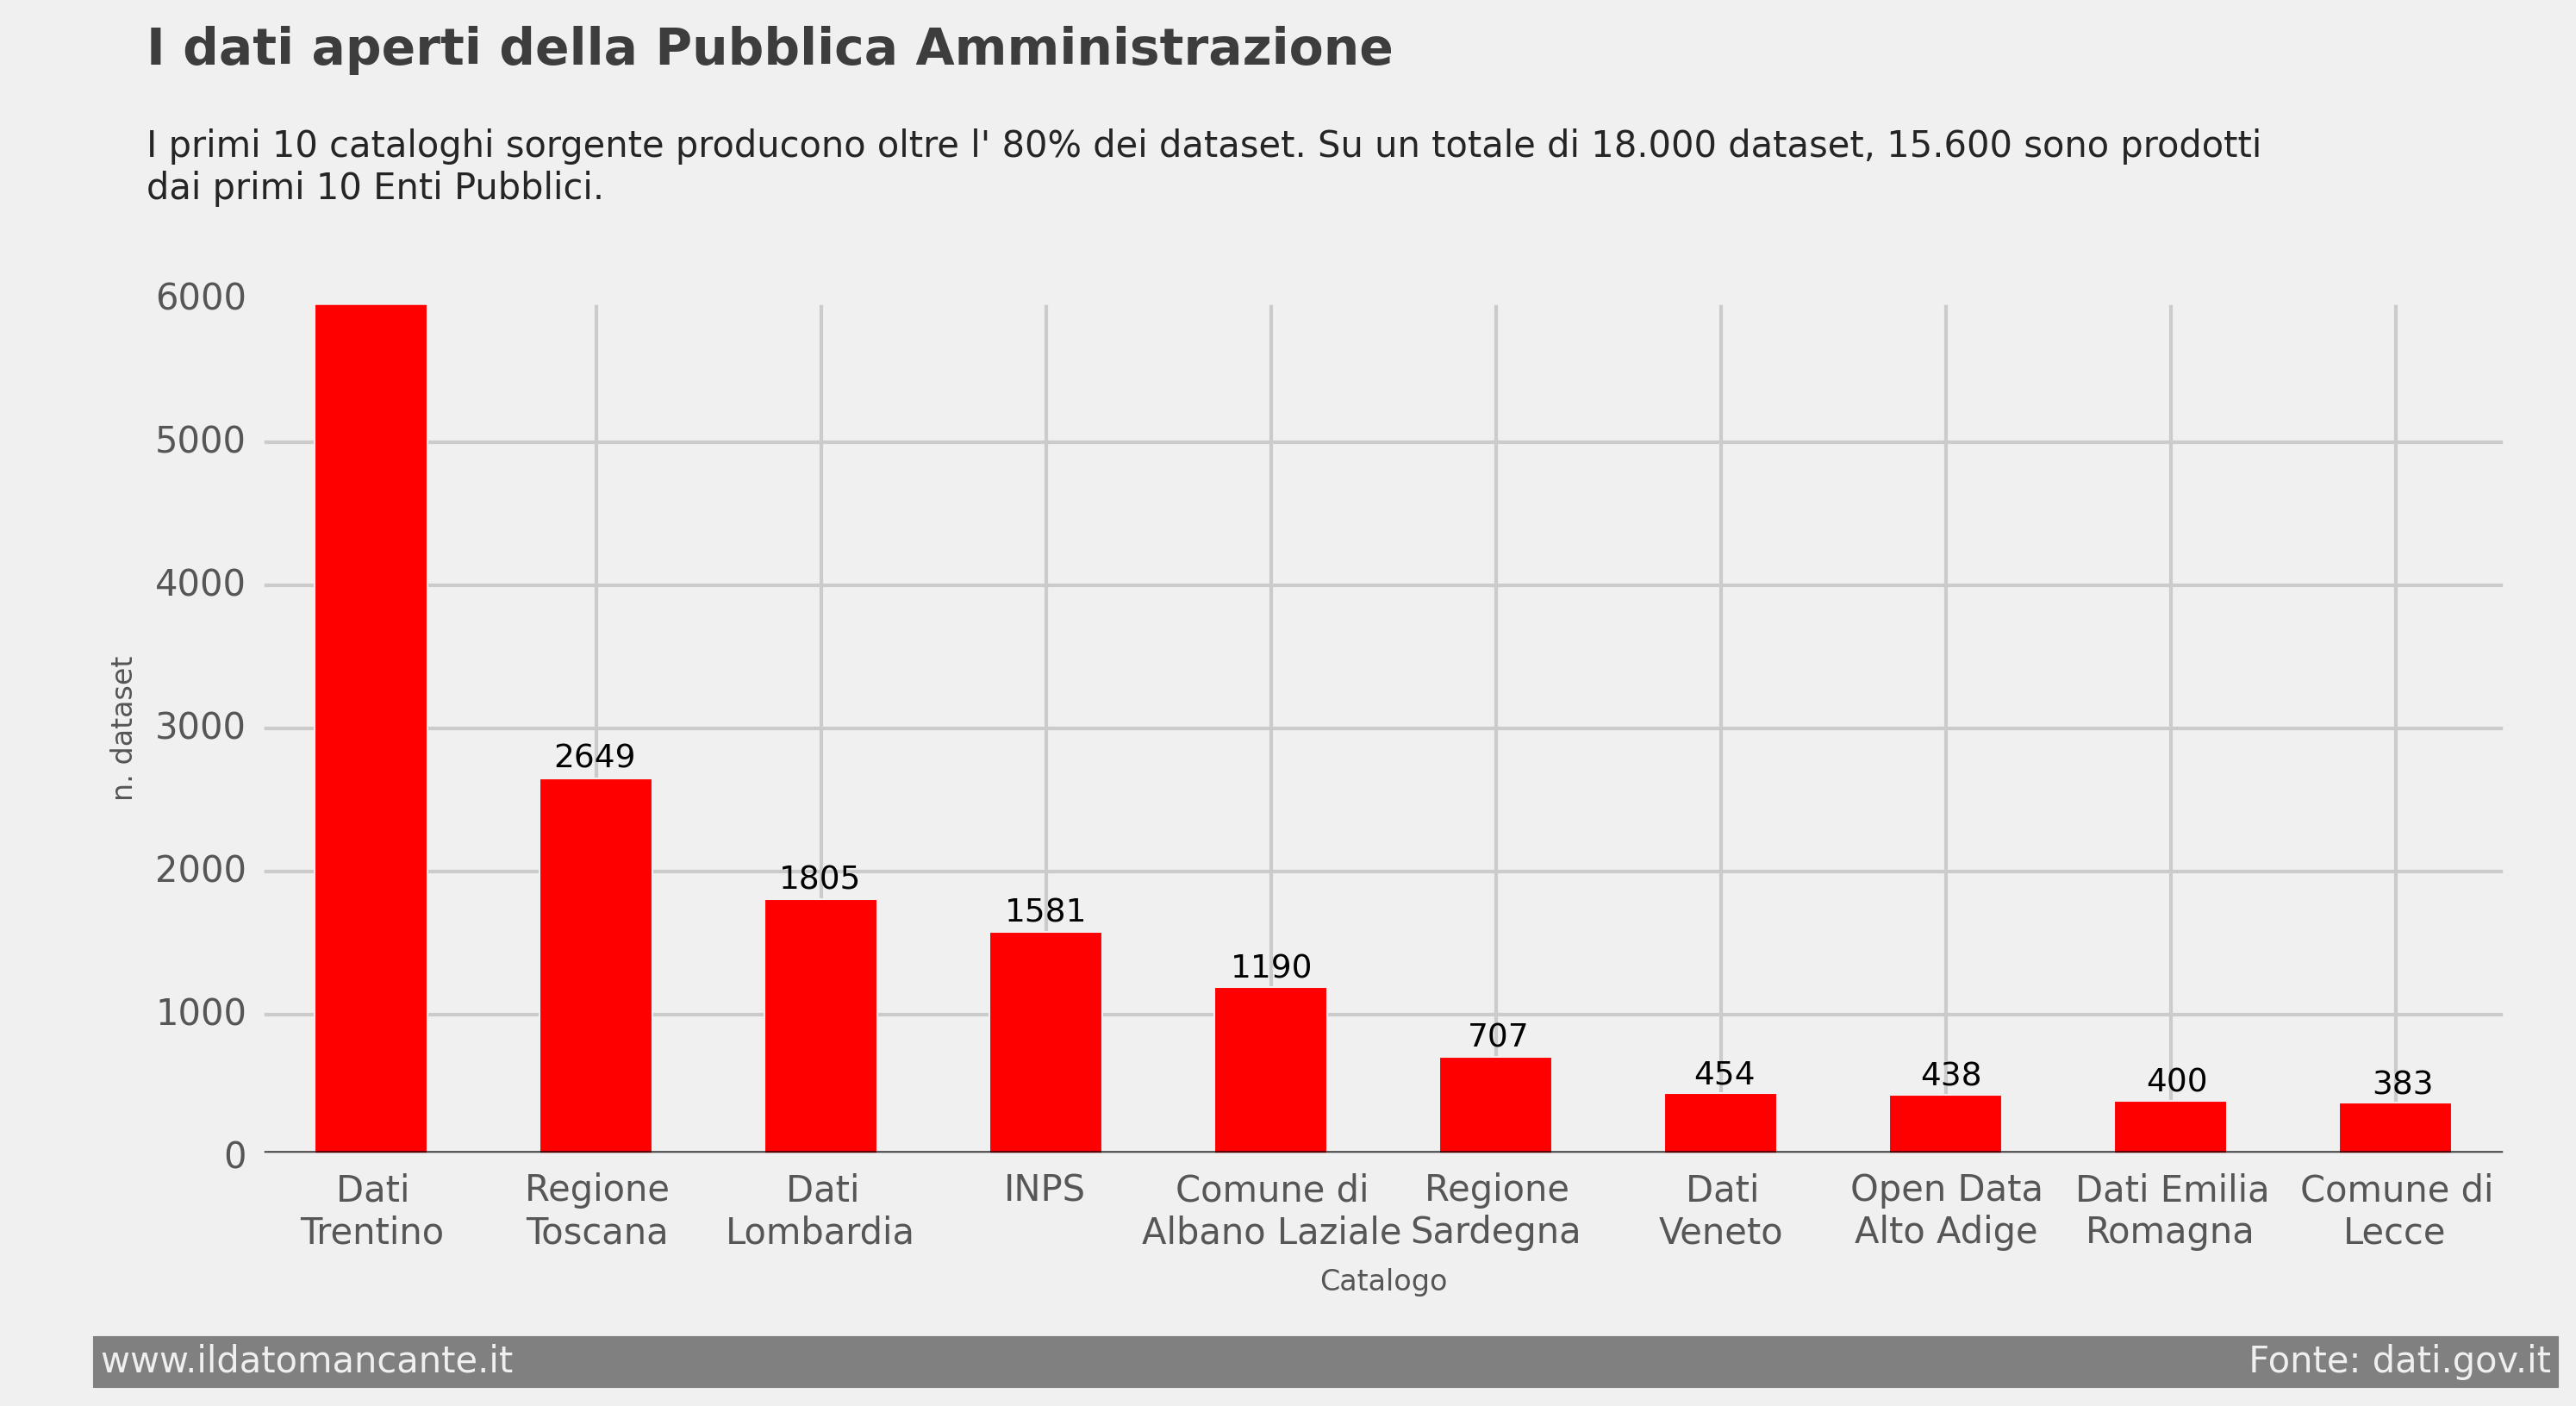 Catalogo Open Data